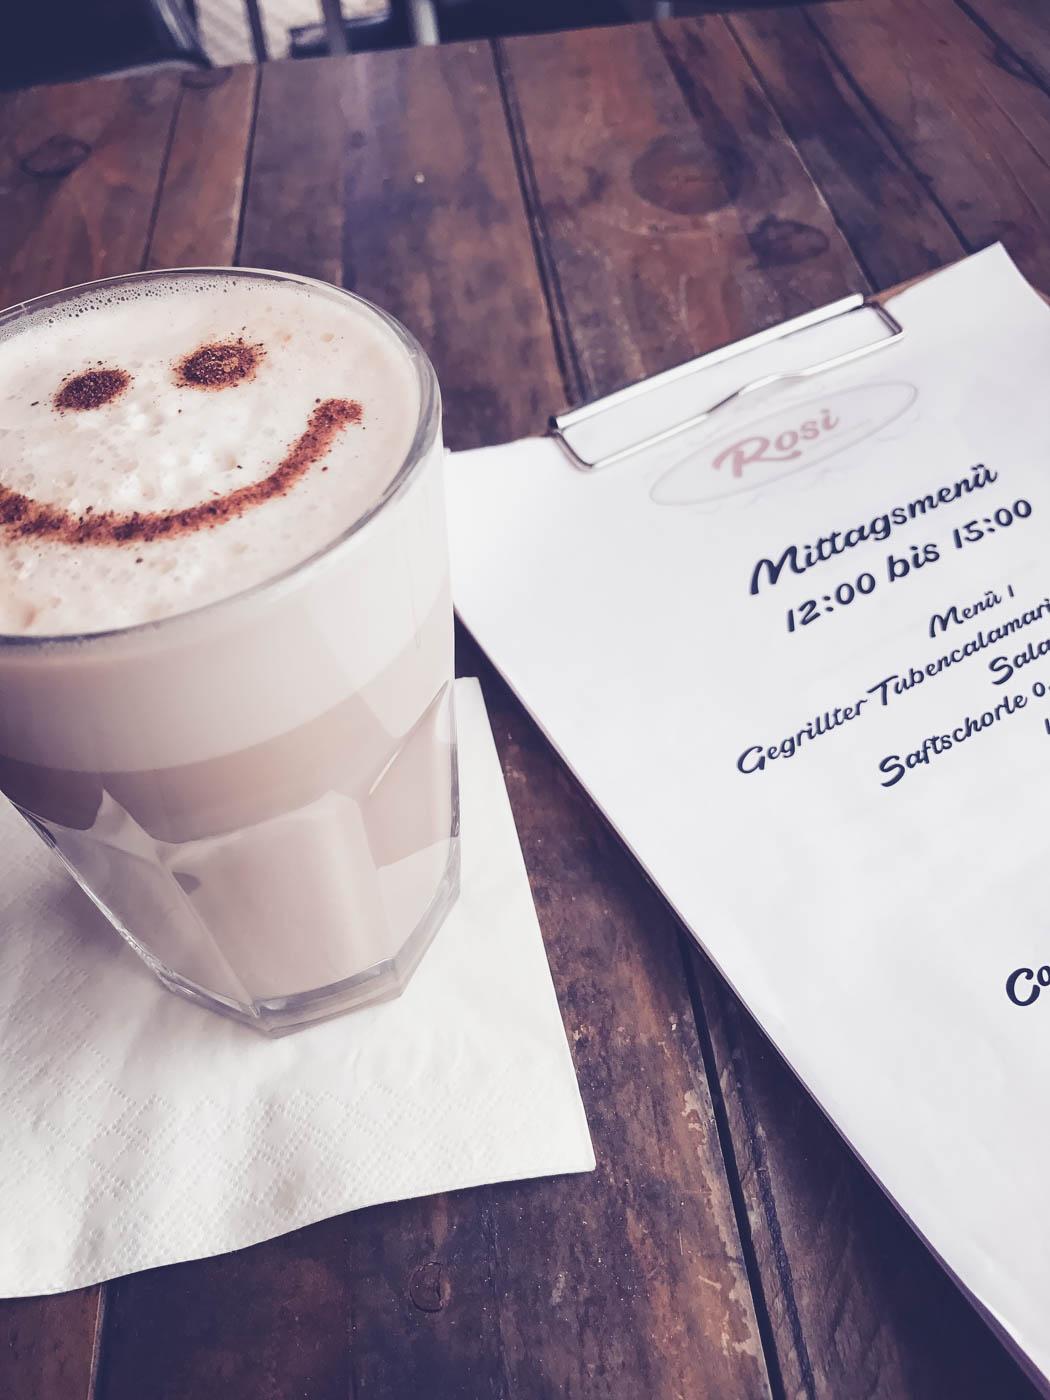 Rosi-Muenchen-Kaffeehaus-Rosenheimer-Strasse